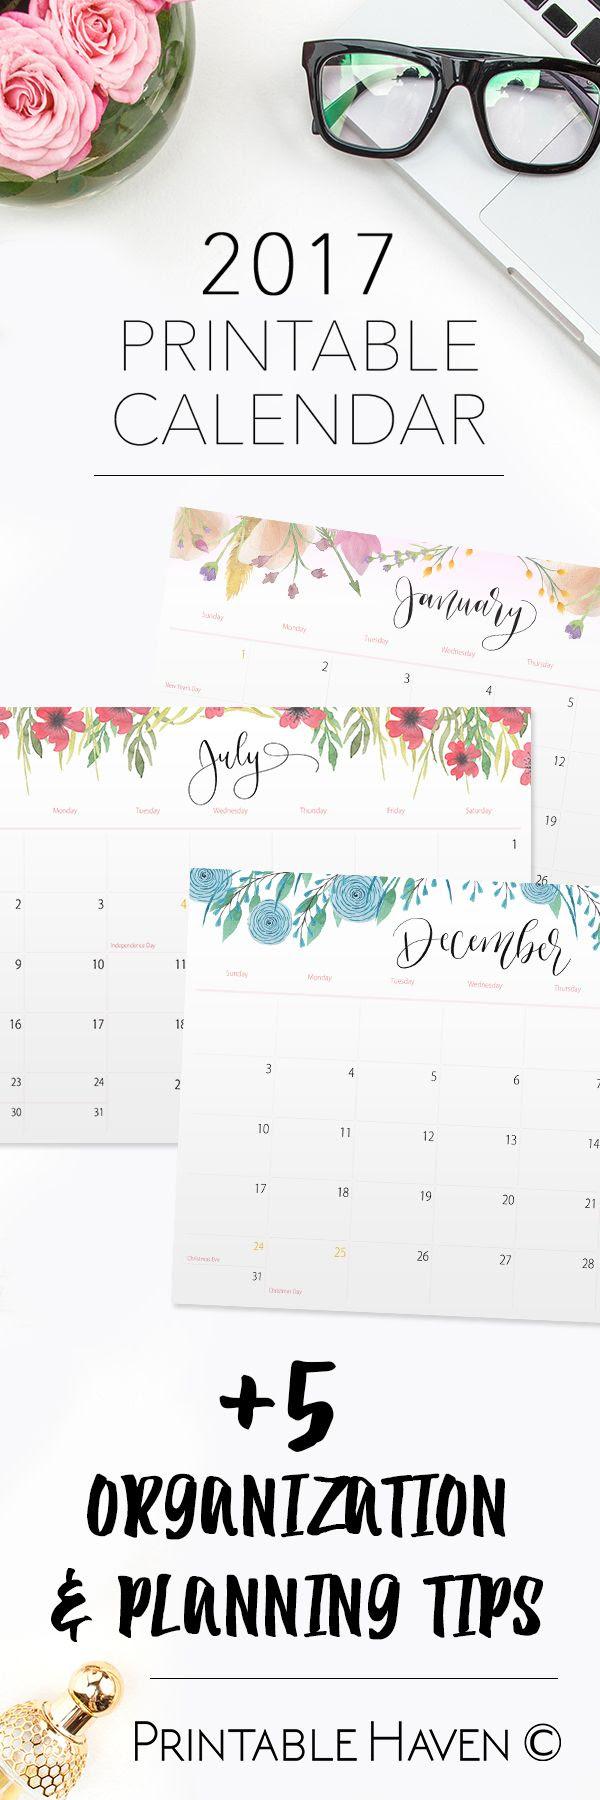 1000+ ideas about 2017 Calendar Printable on Pinterest | May 2017 ...